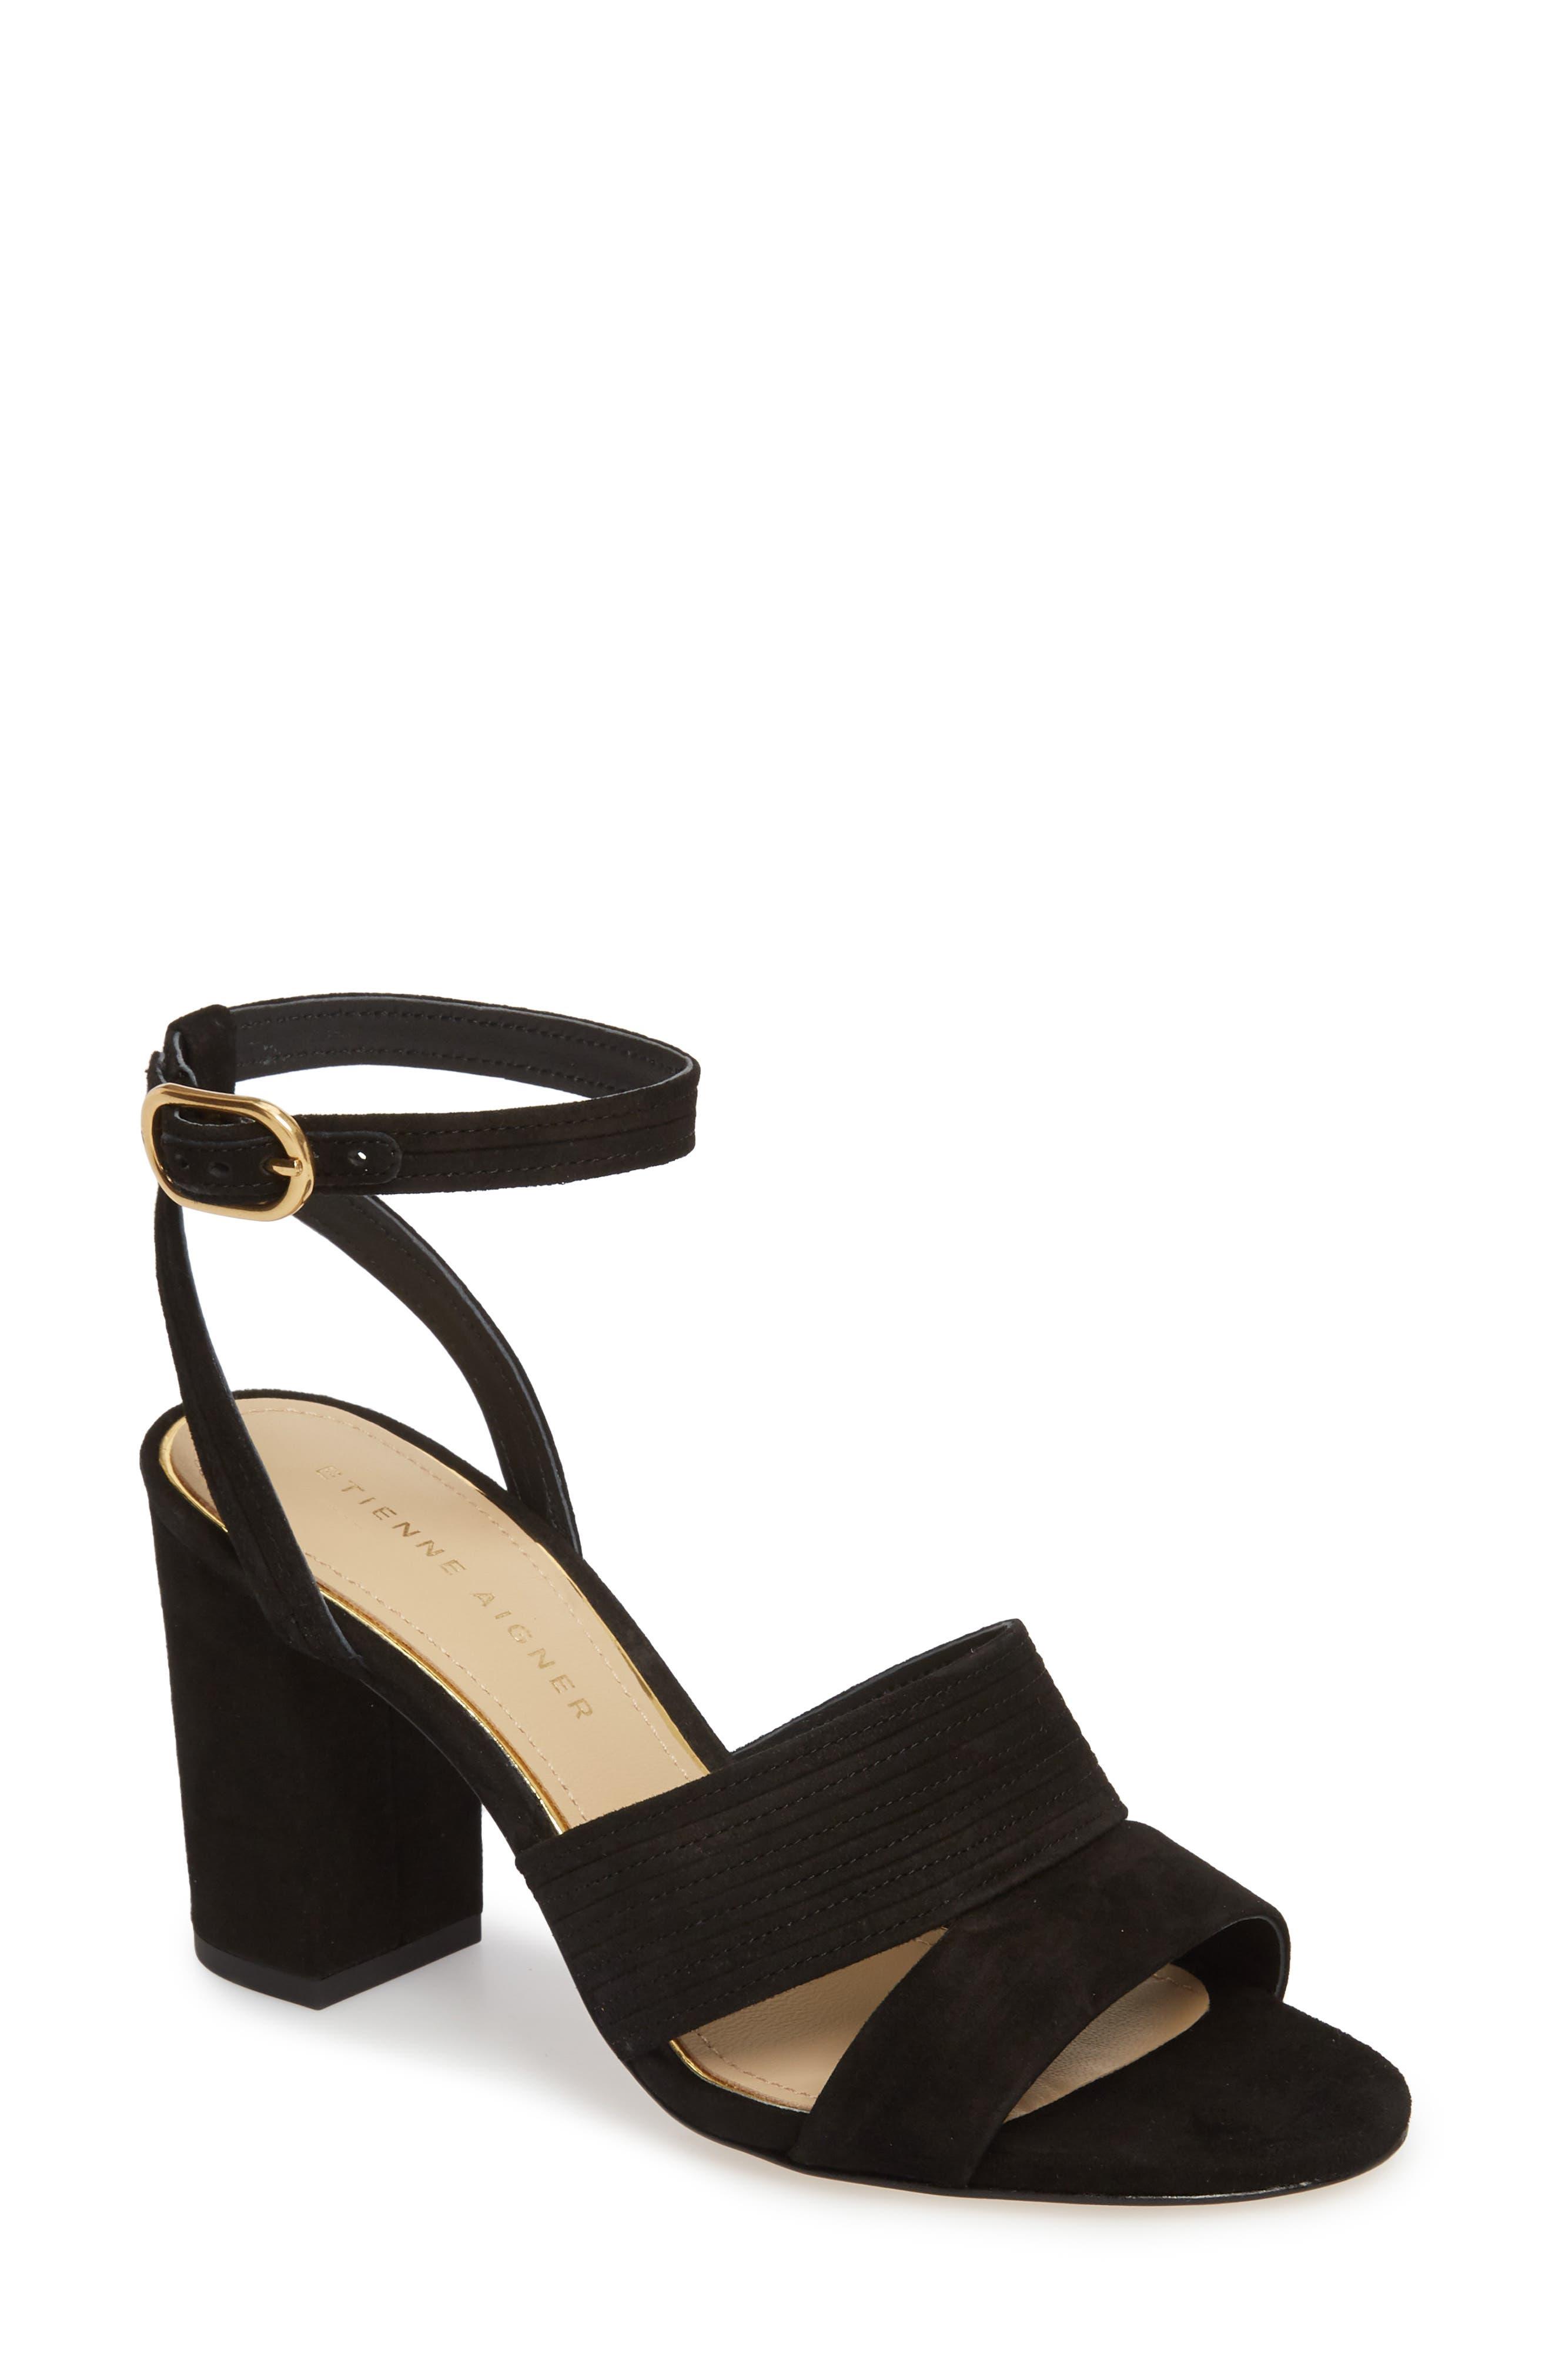 Legend Ankle Strap Sandal,                         Main,                         color, BLACK SUEDE